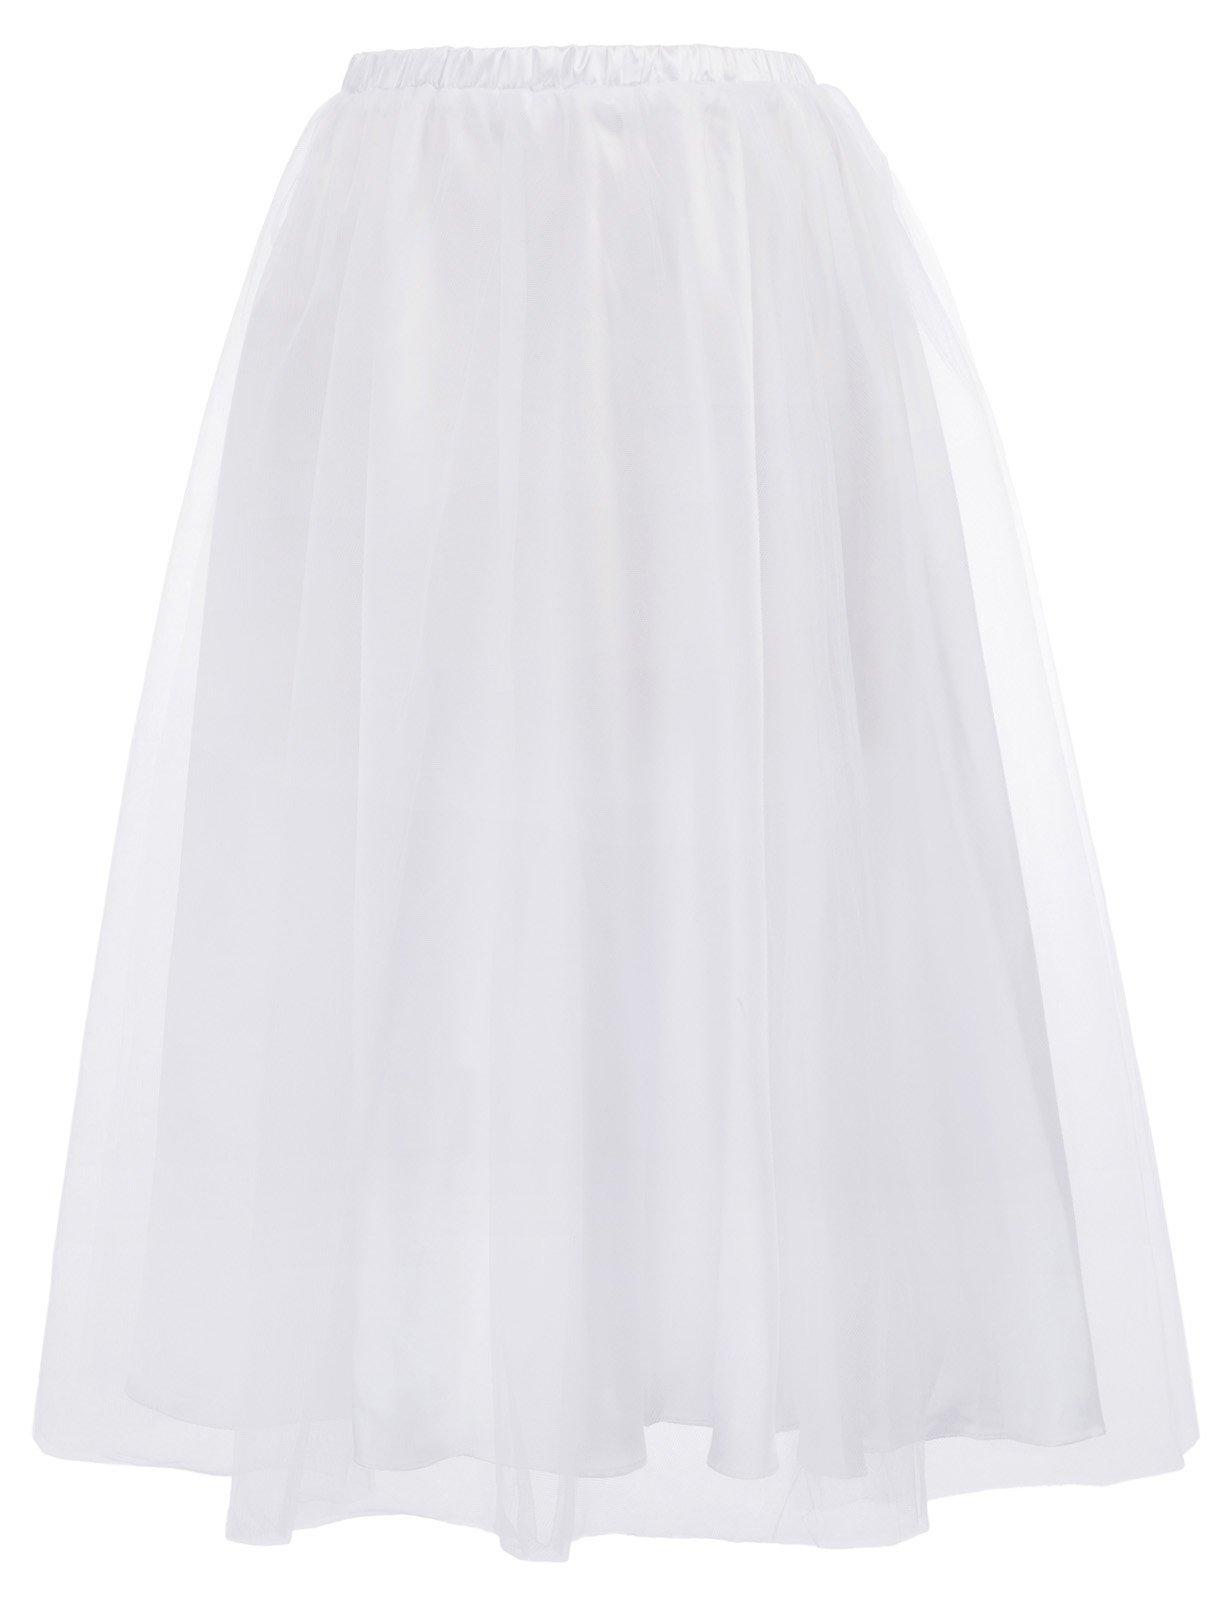 Women's 2-Layer Short A Line Tutu Tulle Prom Princess Midi Dance Skirt BP620-2 L White